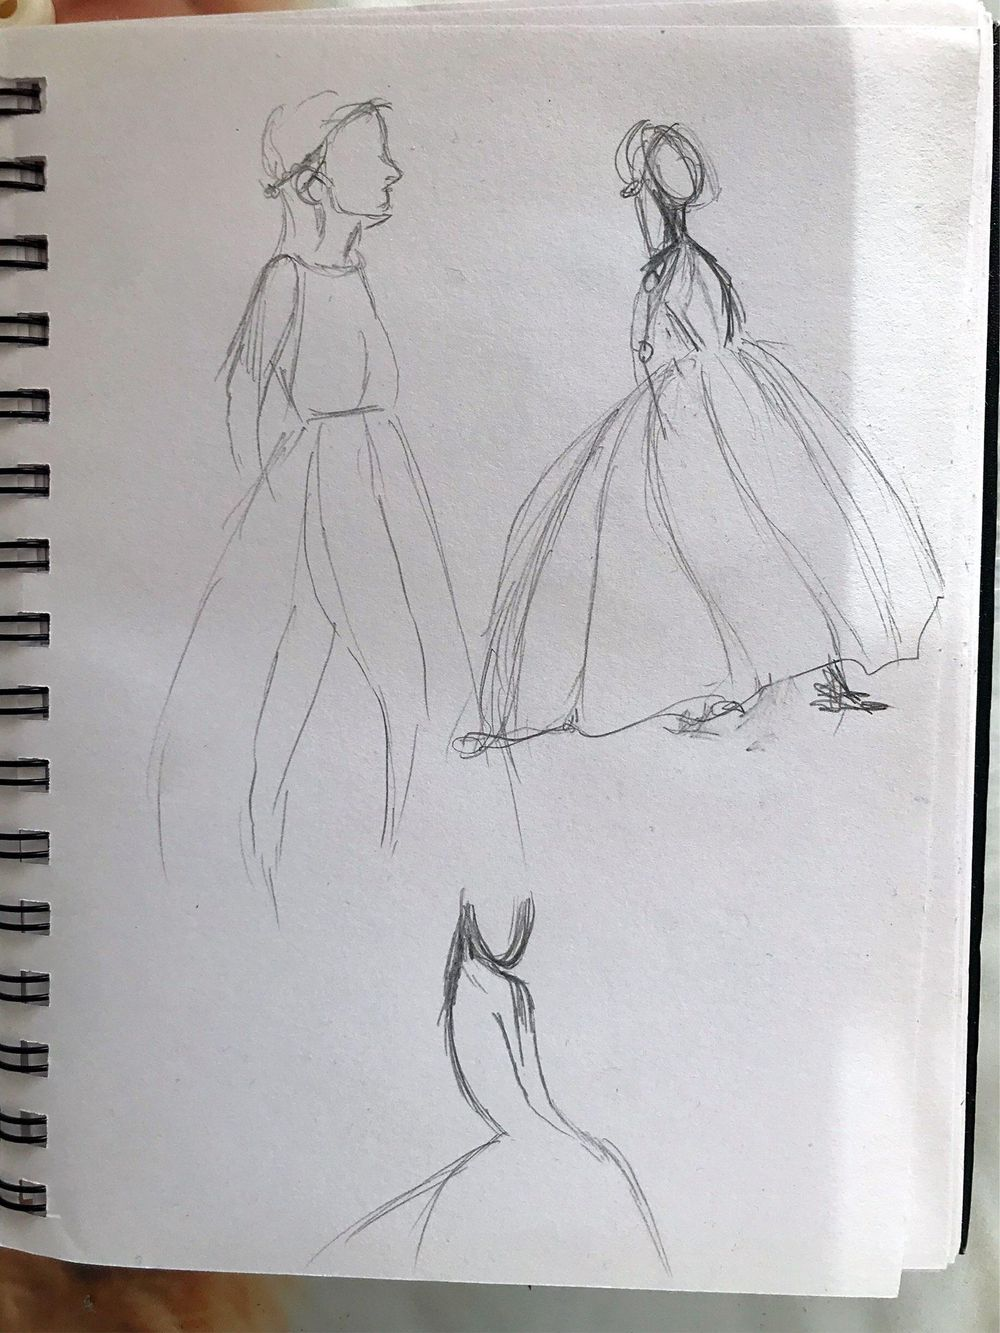 Fashion - image 2 - student project